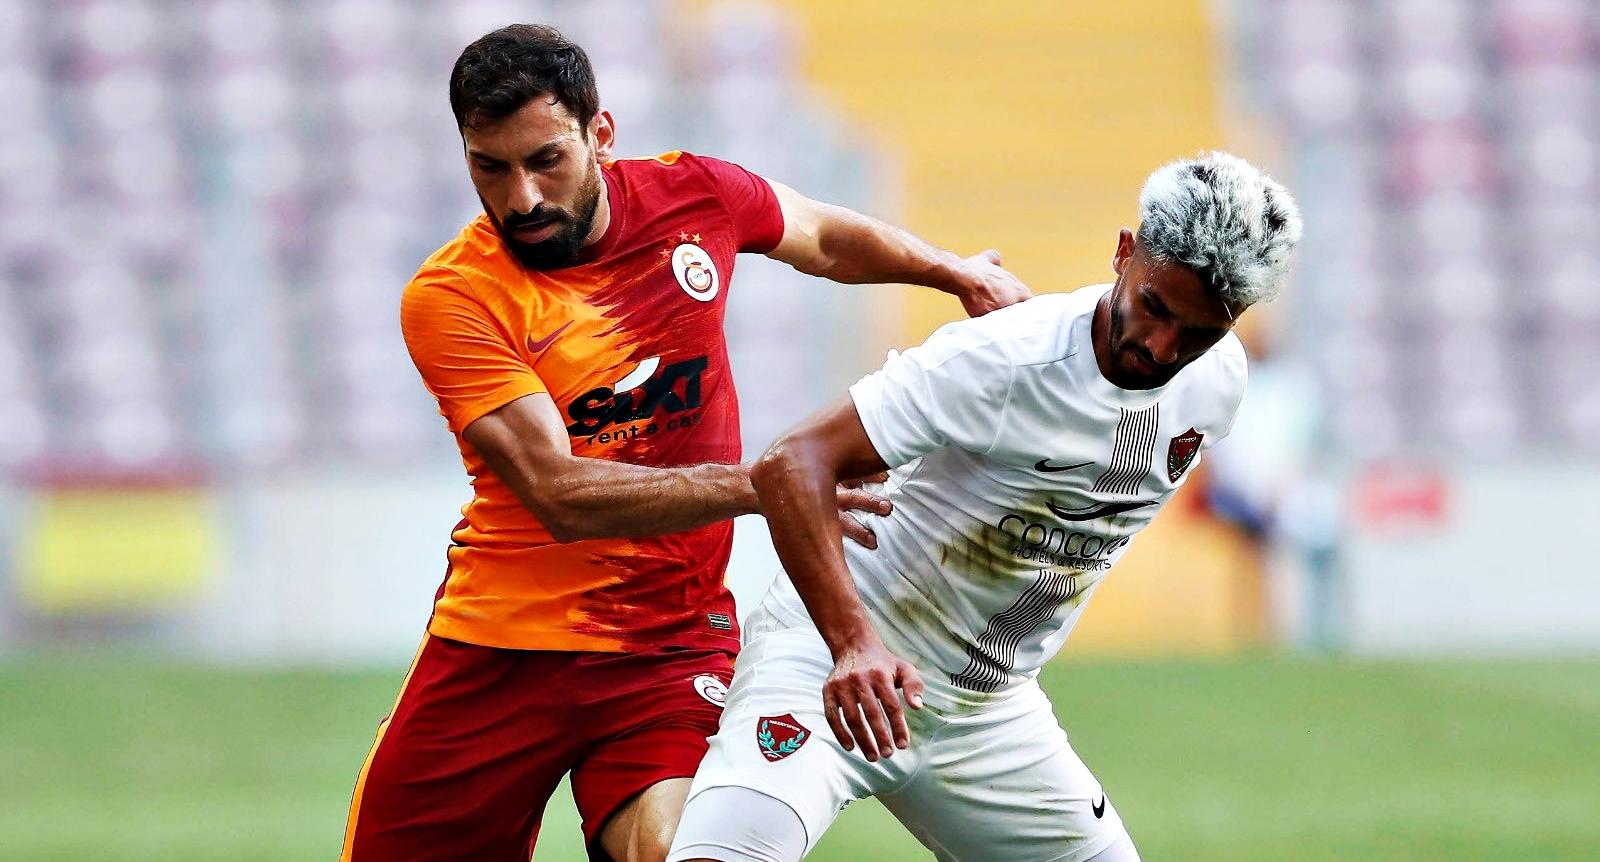 Galatasaray - Hatayspor